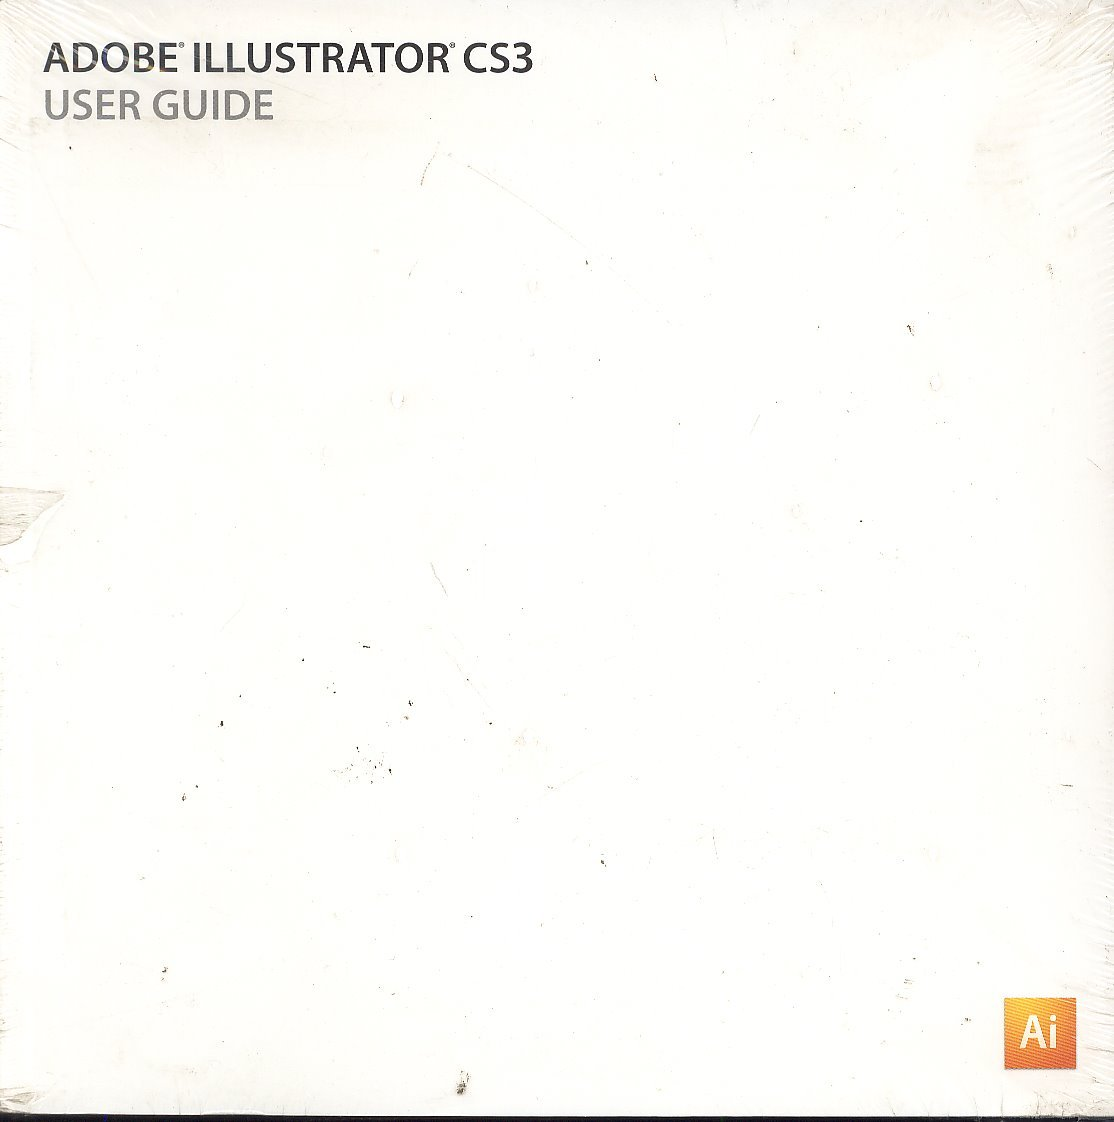 adobe illustrator cs3 user guide adobe systems amazon com books rh amazon com Adobe InDesign Adobe Illustrator Icon